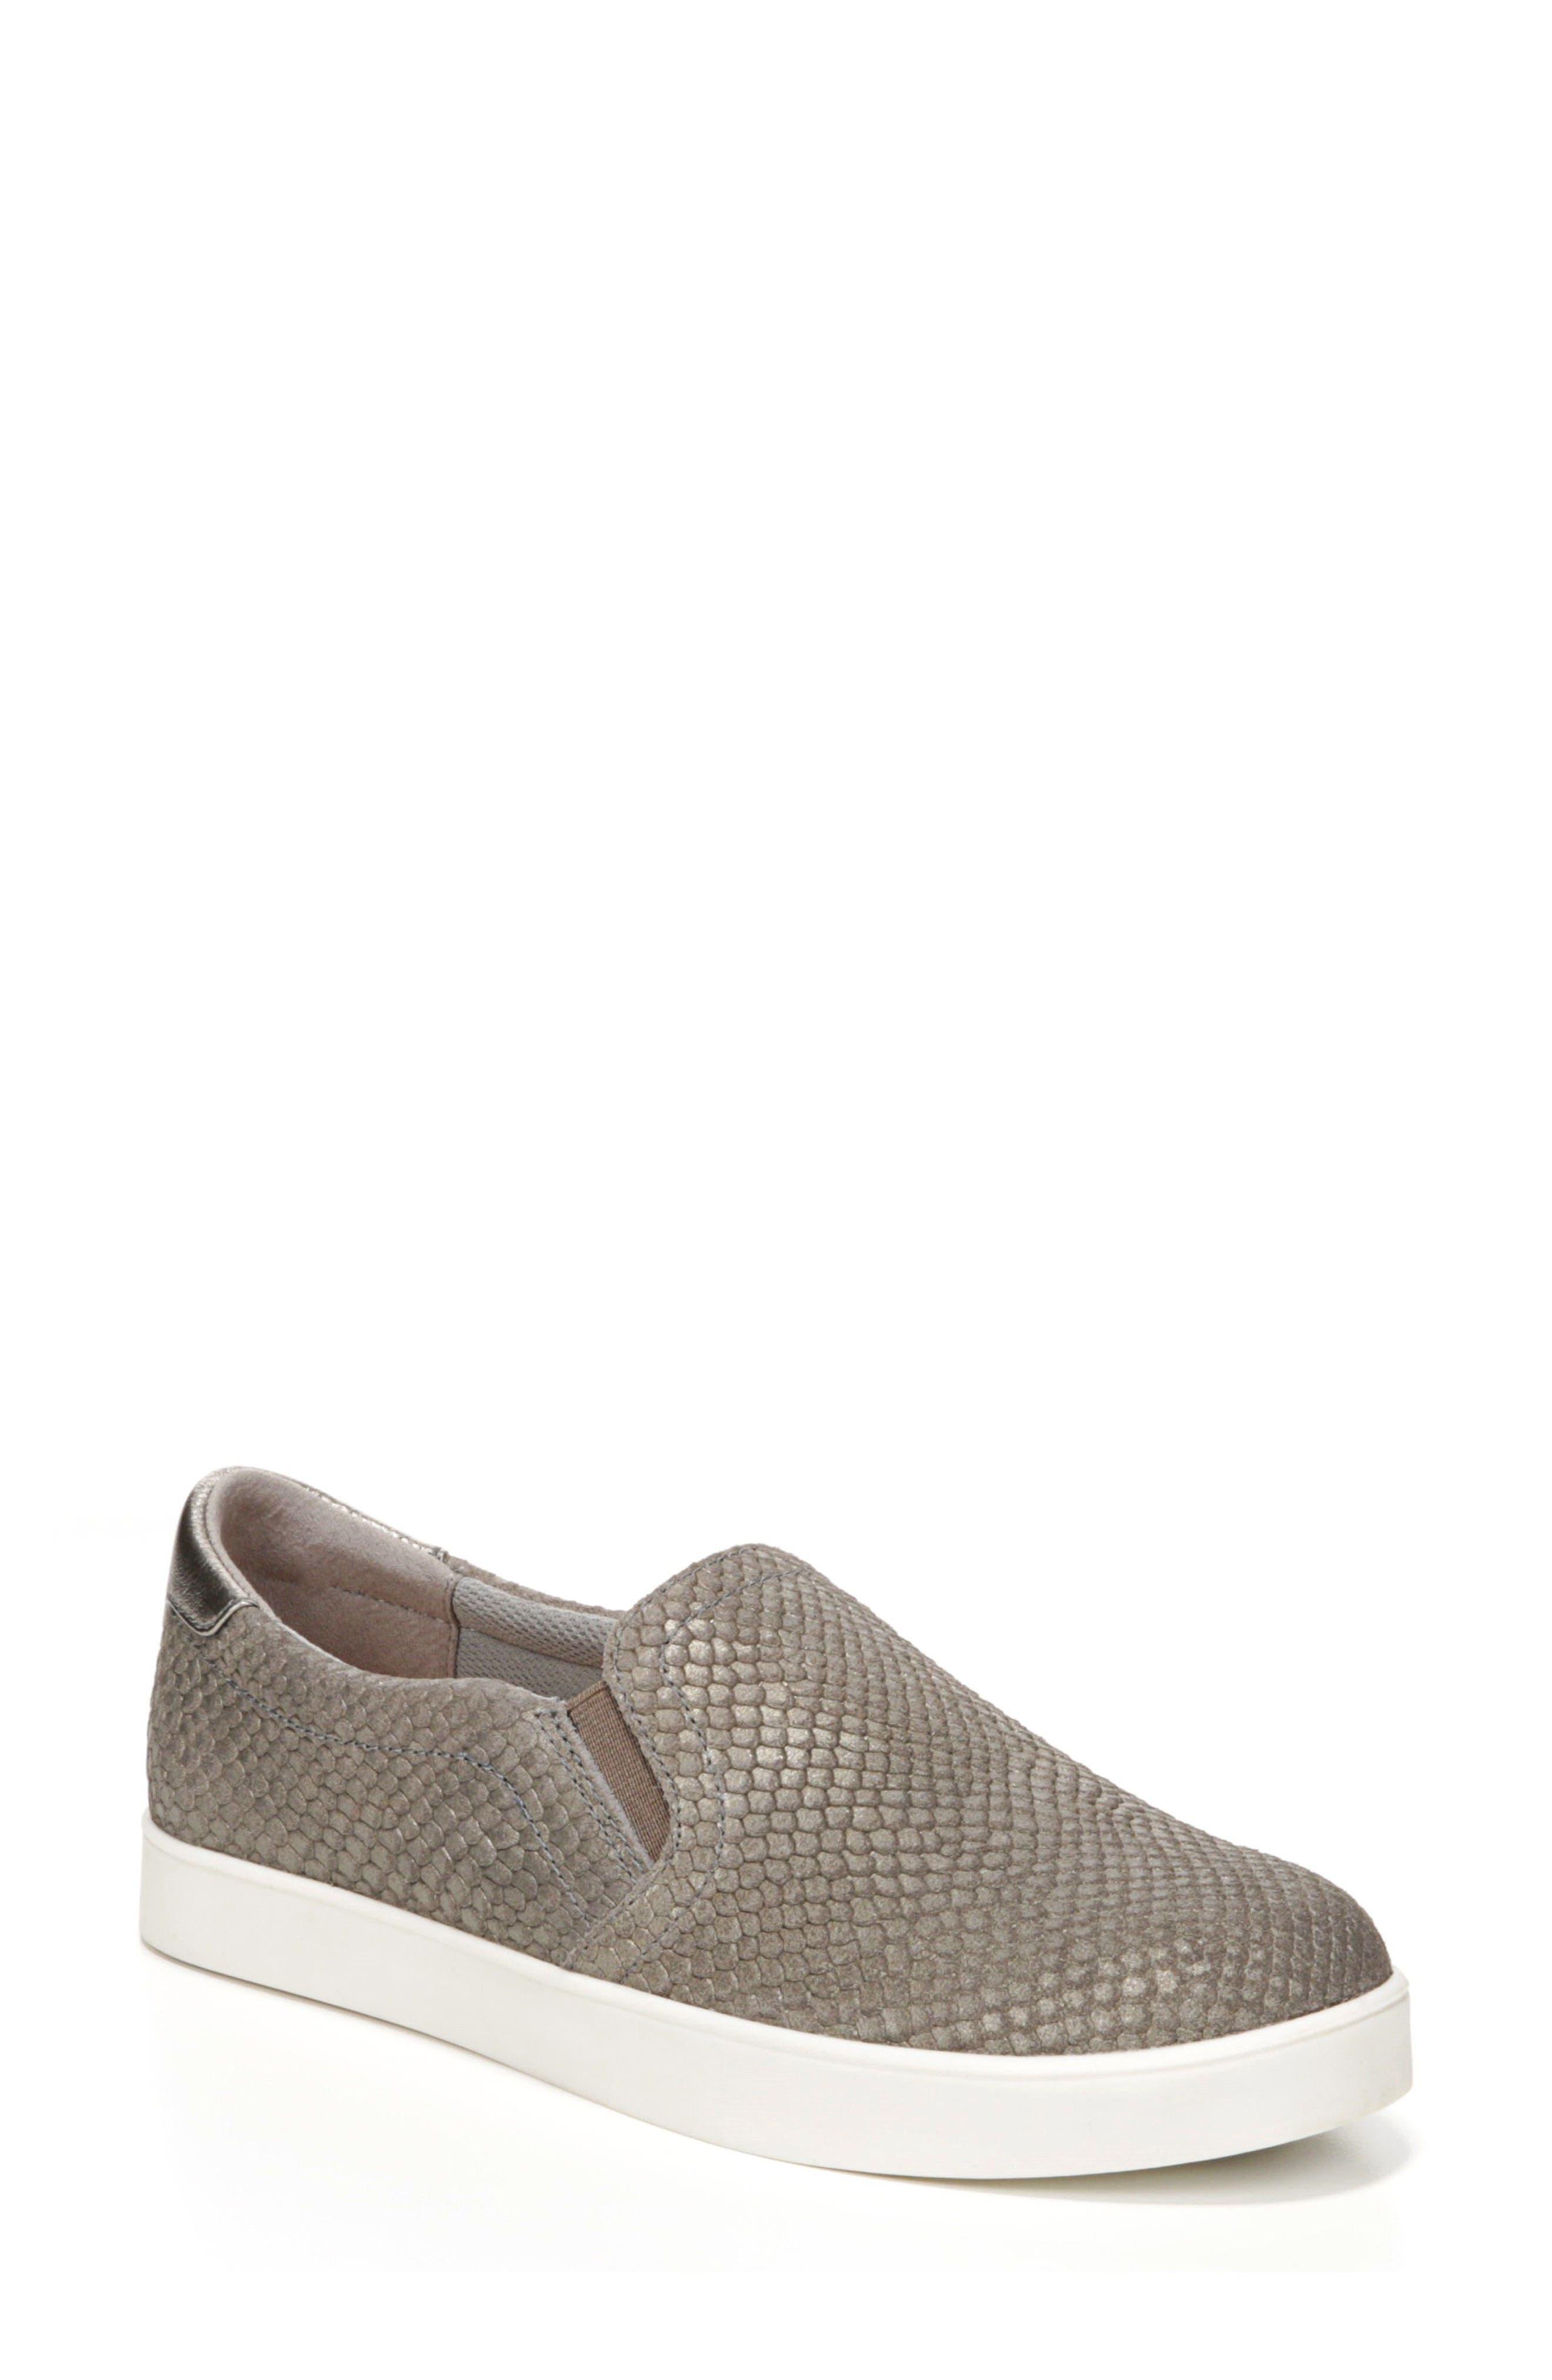 a shoes foot walk comforter capezio com nasar doctor thefashiontamer easy friend shoe comfort to get makes qzpndzs